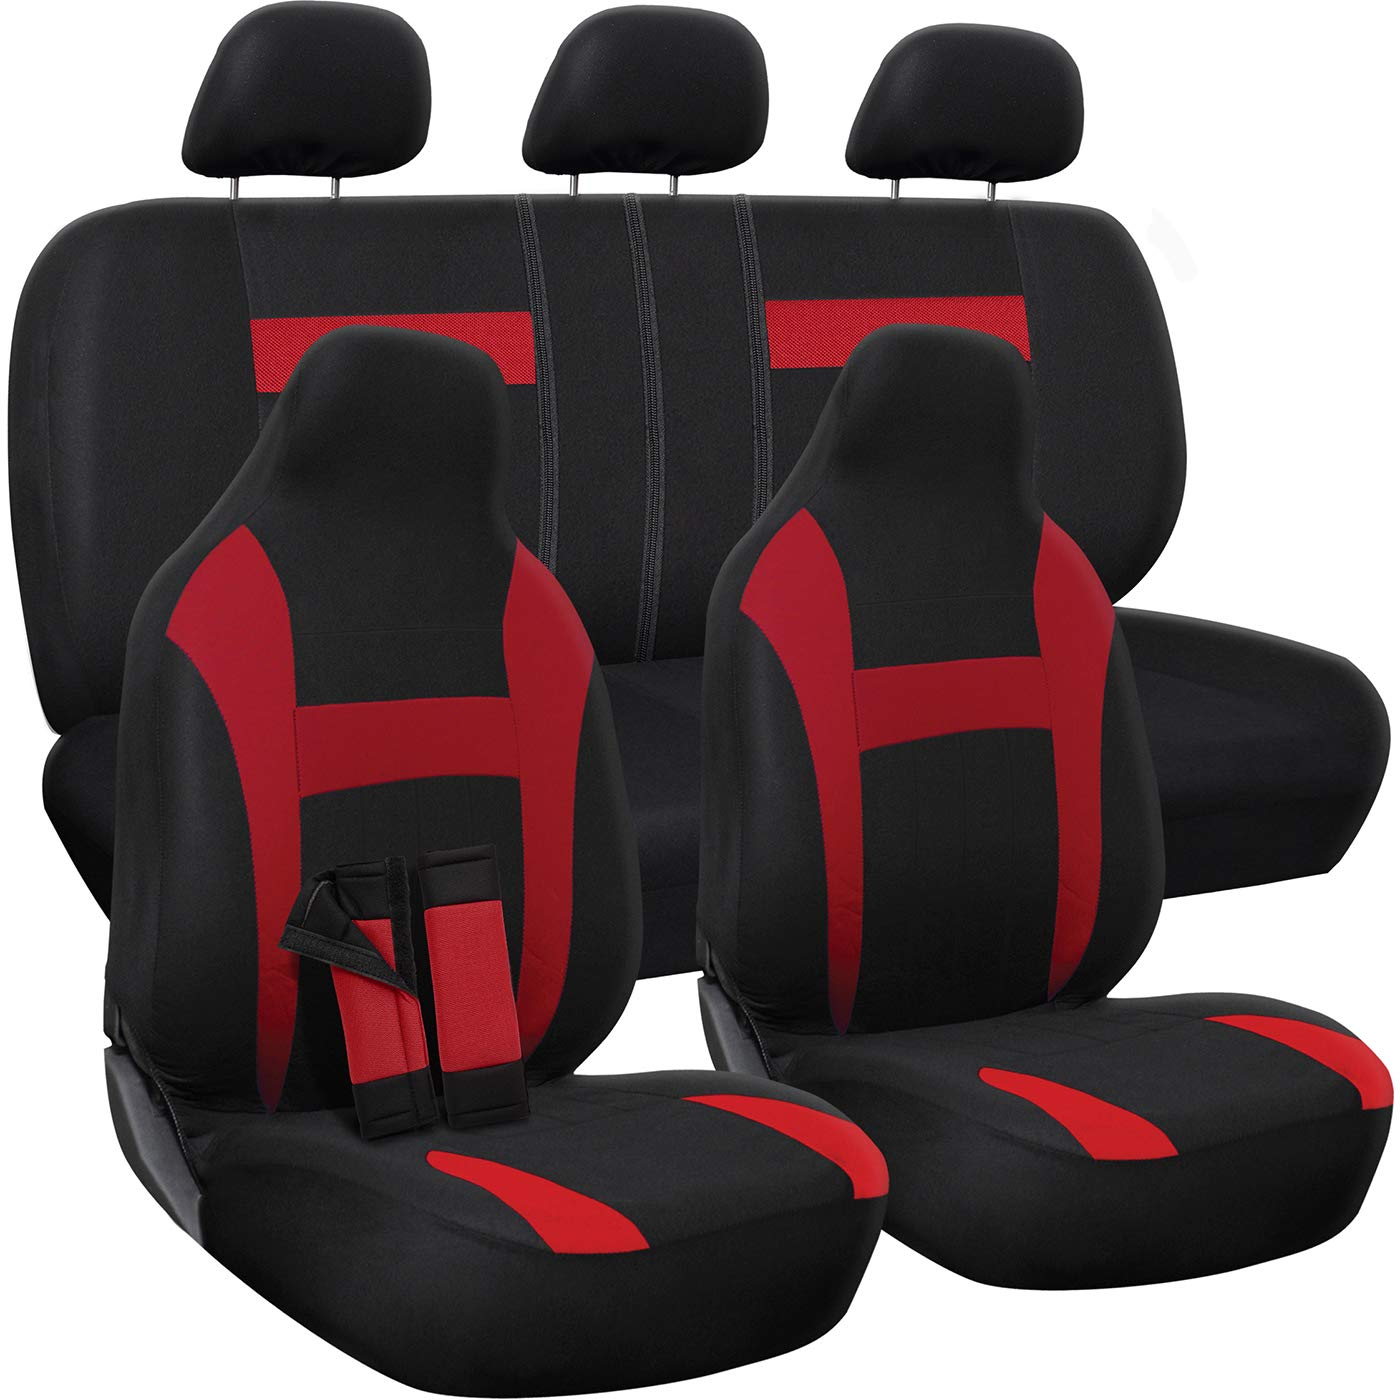 OxGord Car Seat Cover - Red/Black fits Car, Truck, Van, SUV - Full Set by OxGord